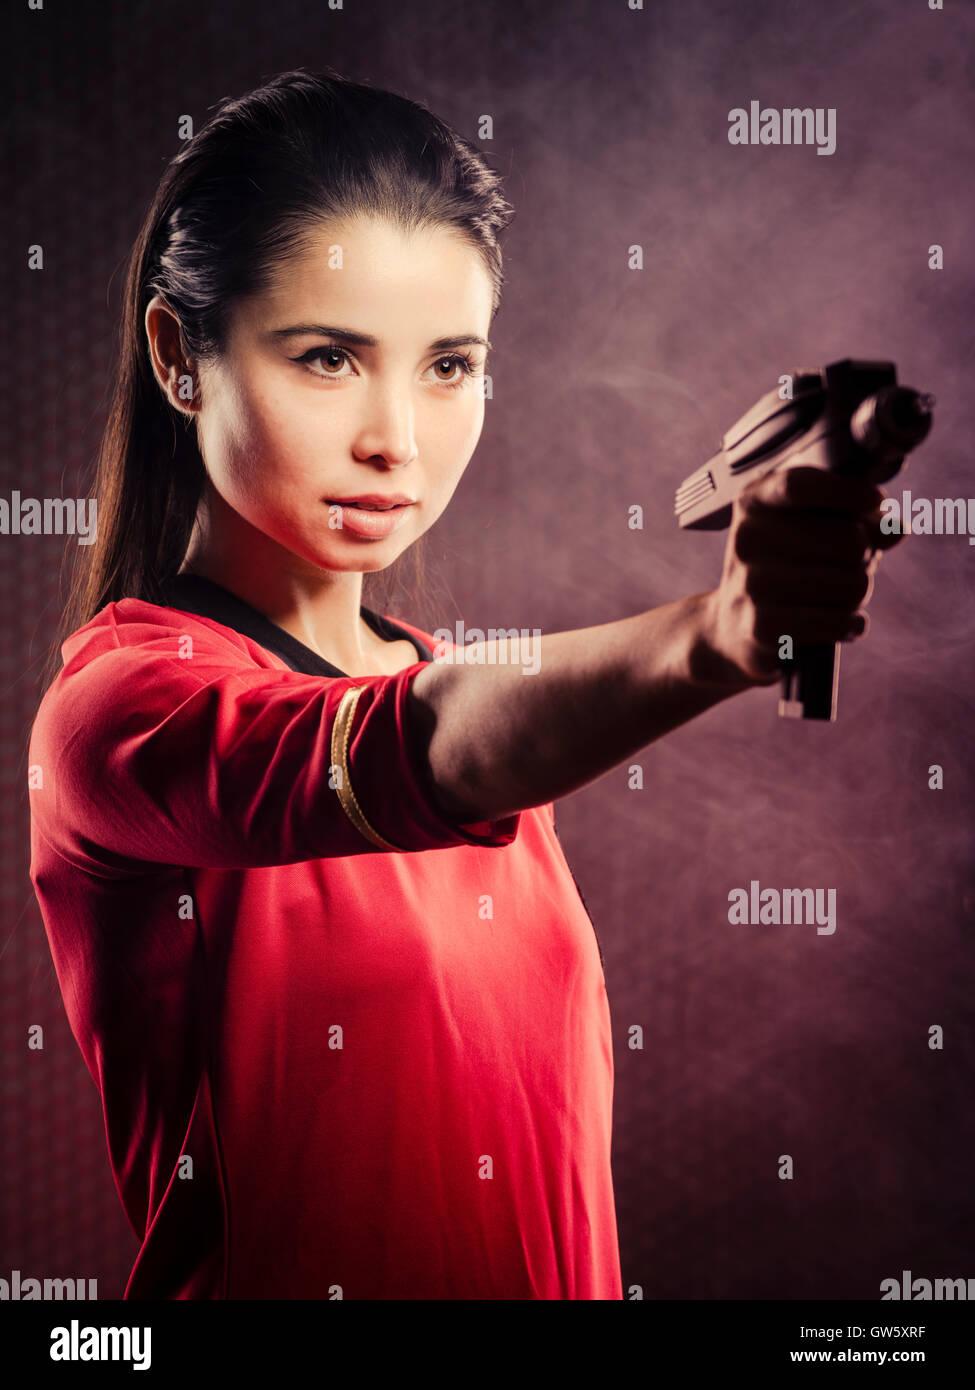 Beautiful trekkie wearing Star Trek original series 1967 red shirt uniform with original phaser - Stock Image